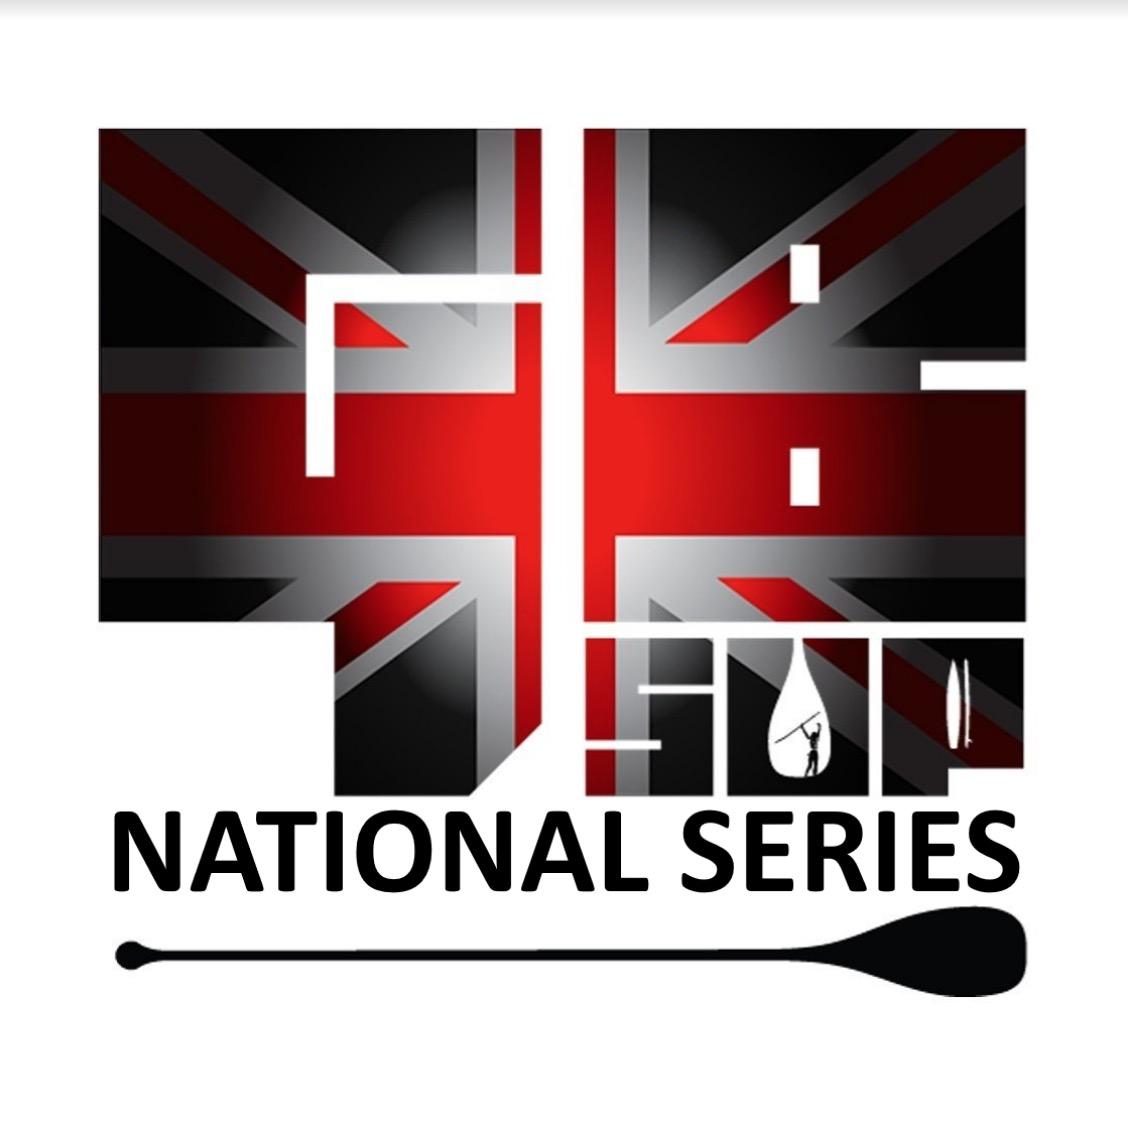 GBSUP National Series 2019